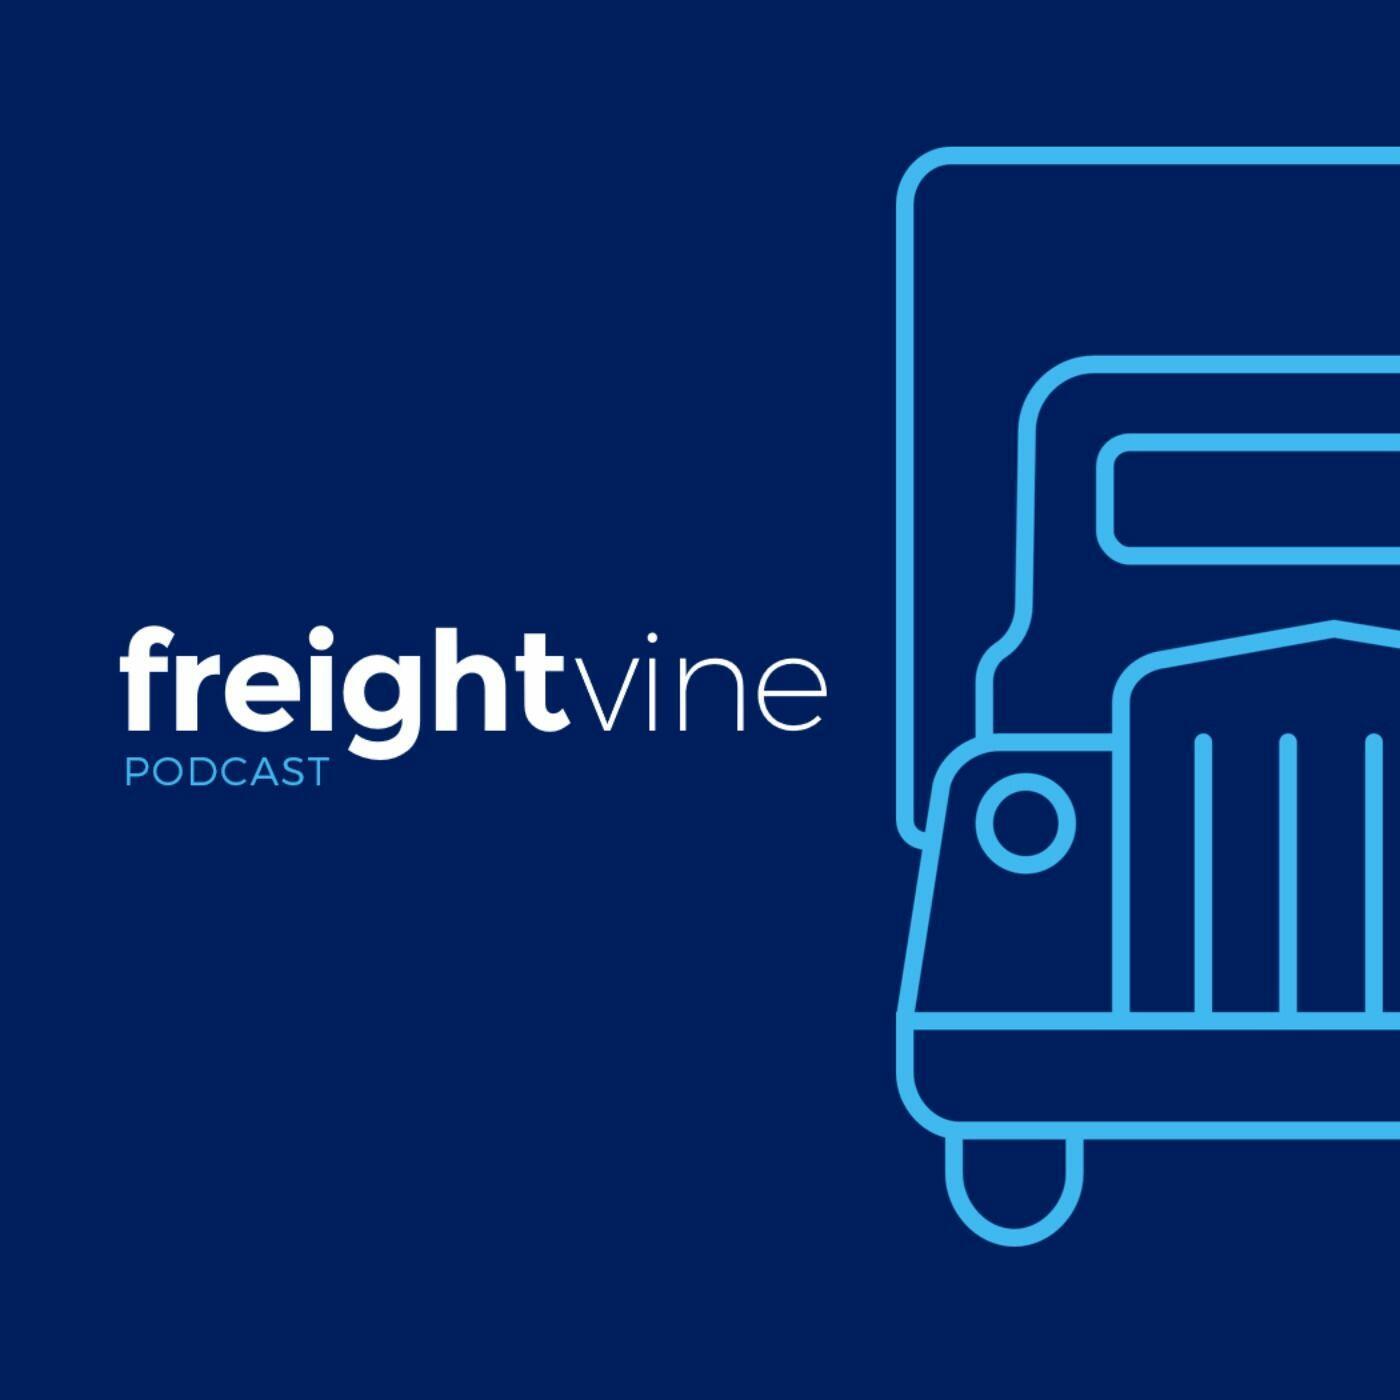 Freightvine